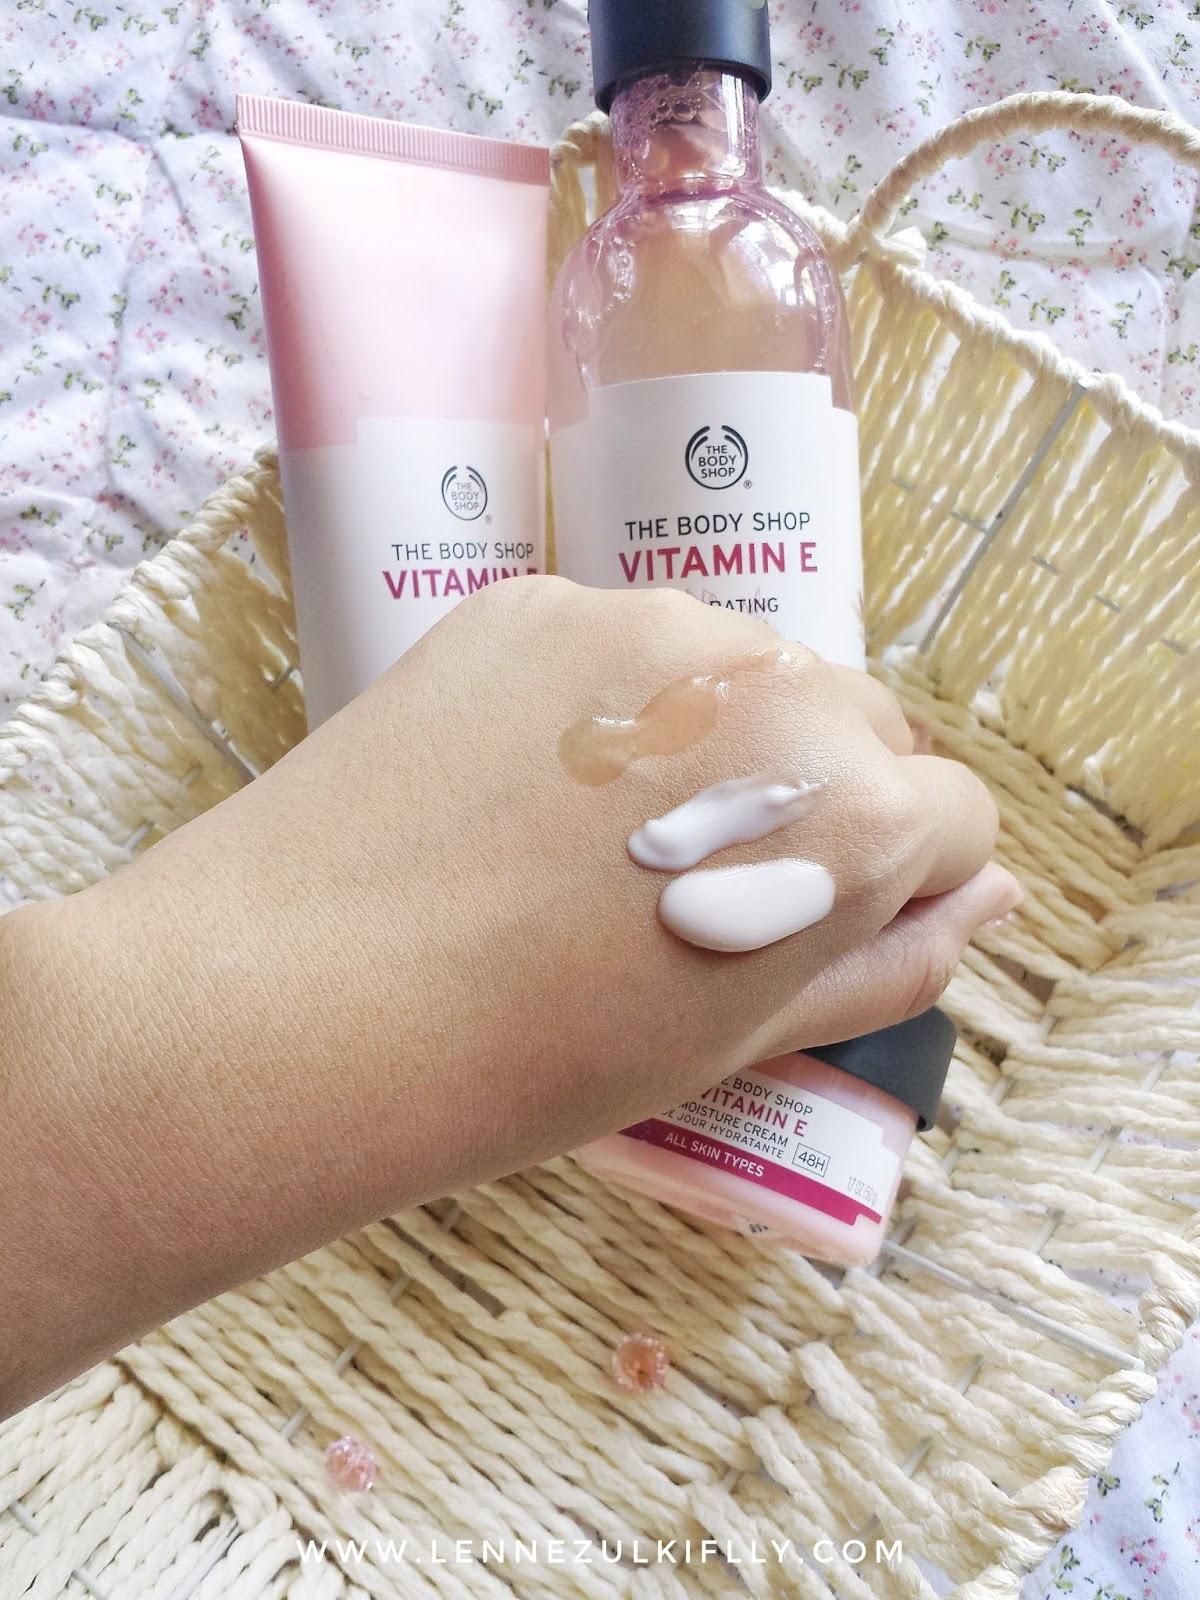 The Body Shop Vitamin E Skincare Range | LENNE ZULKIFLLY